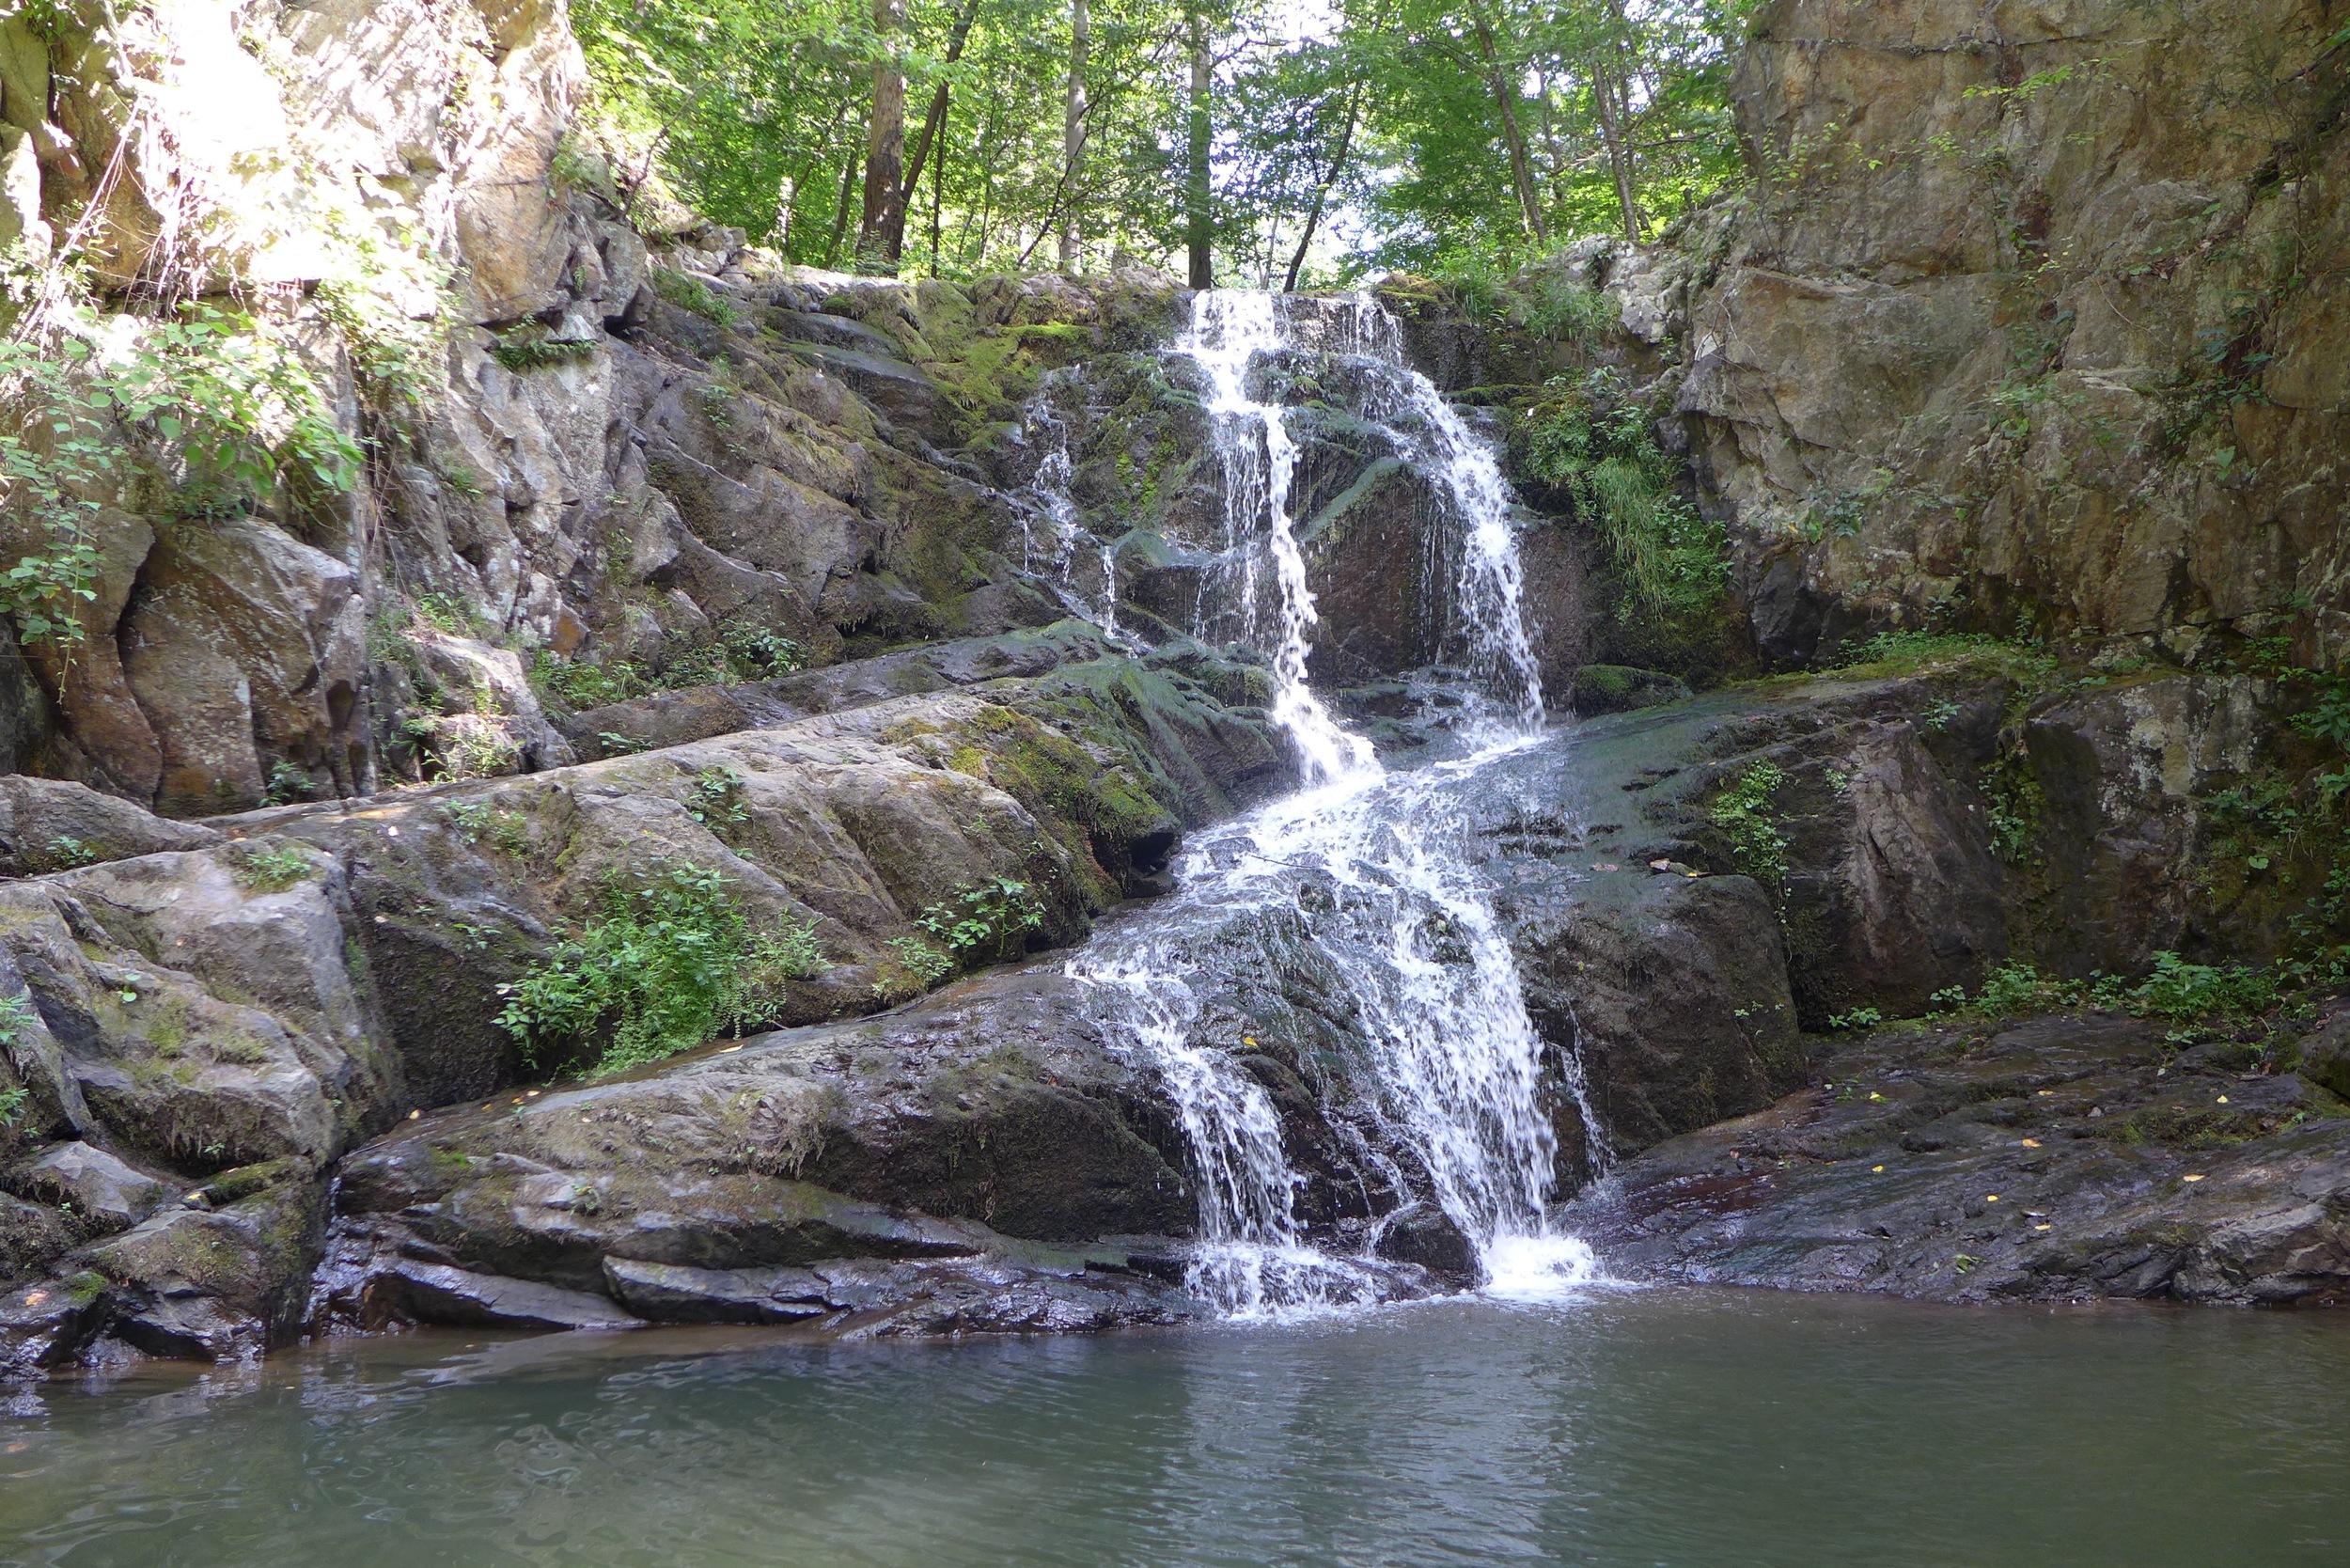 Indian Brook Waterfalls - Cold Spring, NY